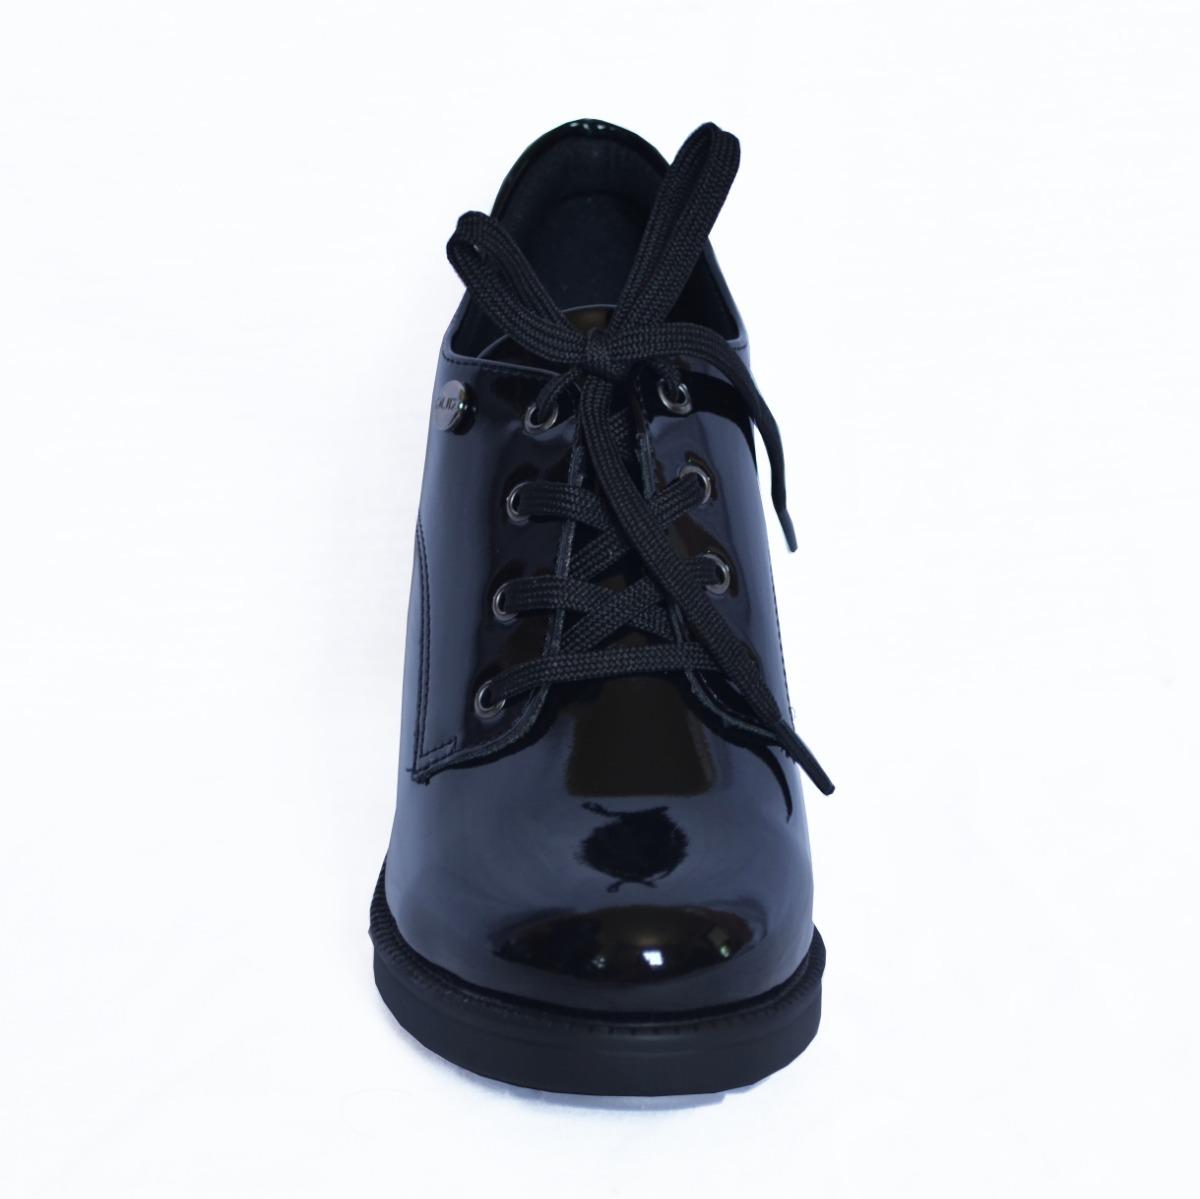 57f12dc81 ... sapato oxford preto verniz brilhante quiz 69-77102. Carregando zoom.